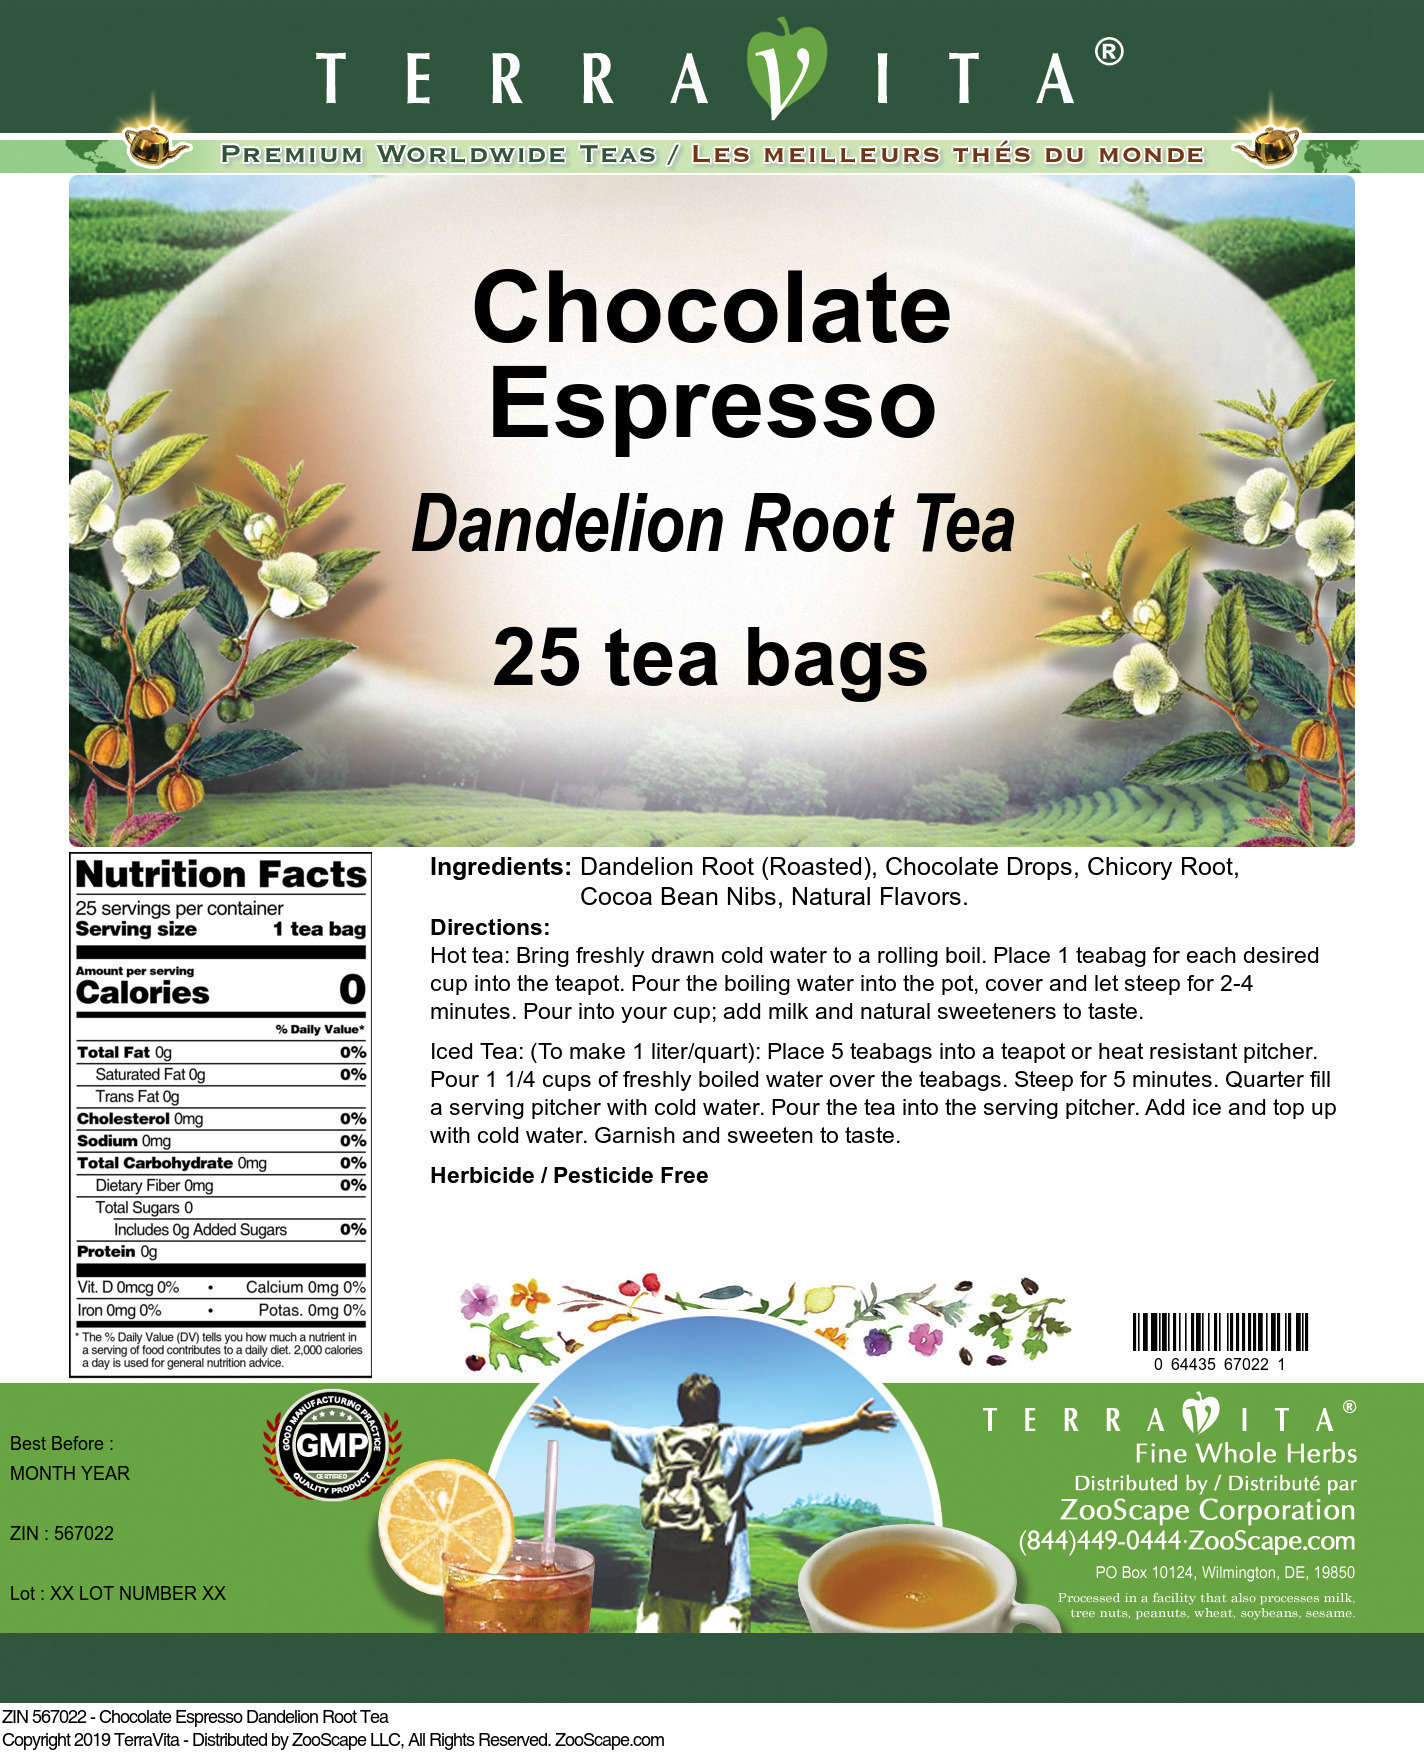 Chocolate Espresso Dandelion Root Tea